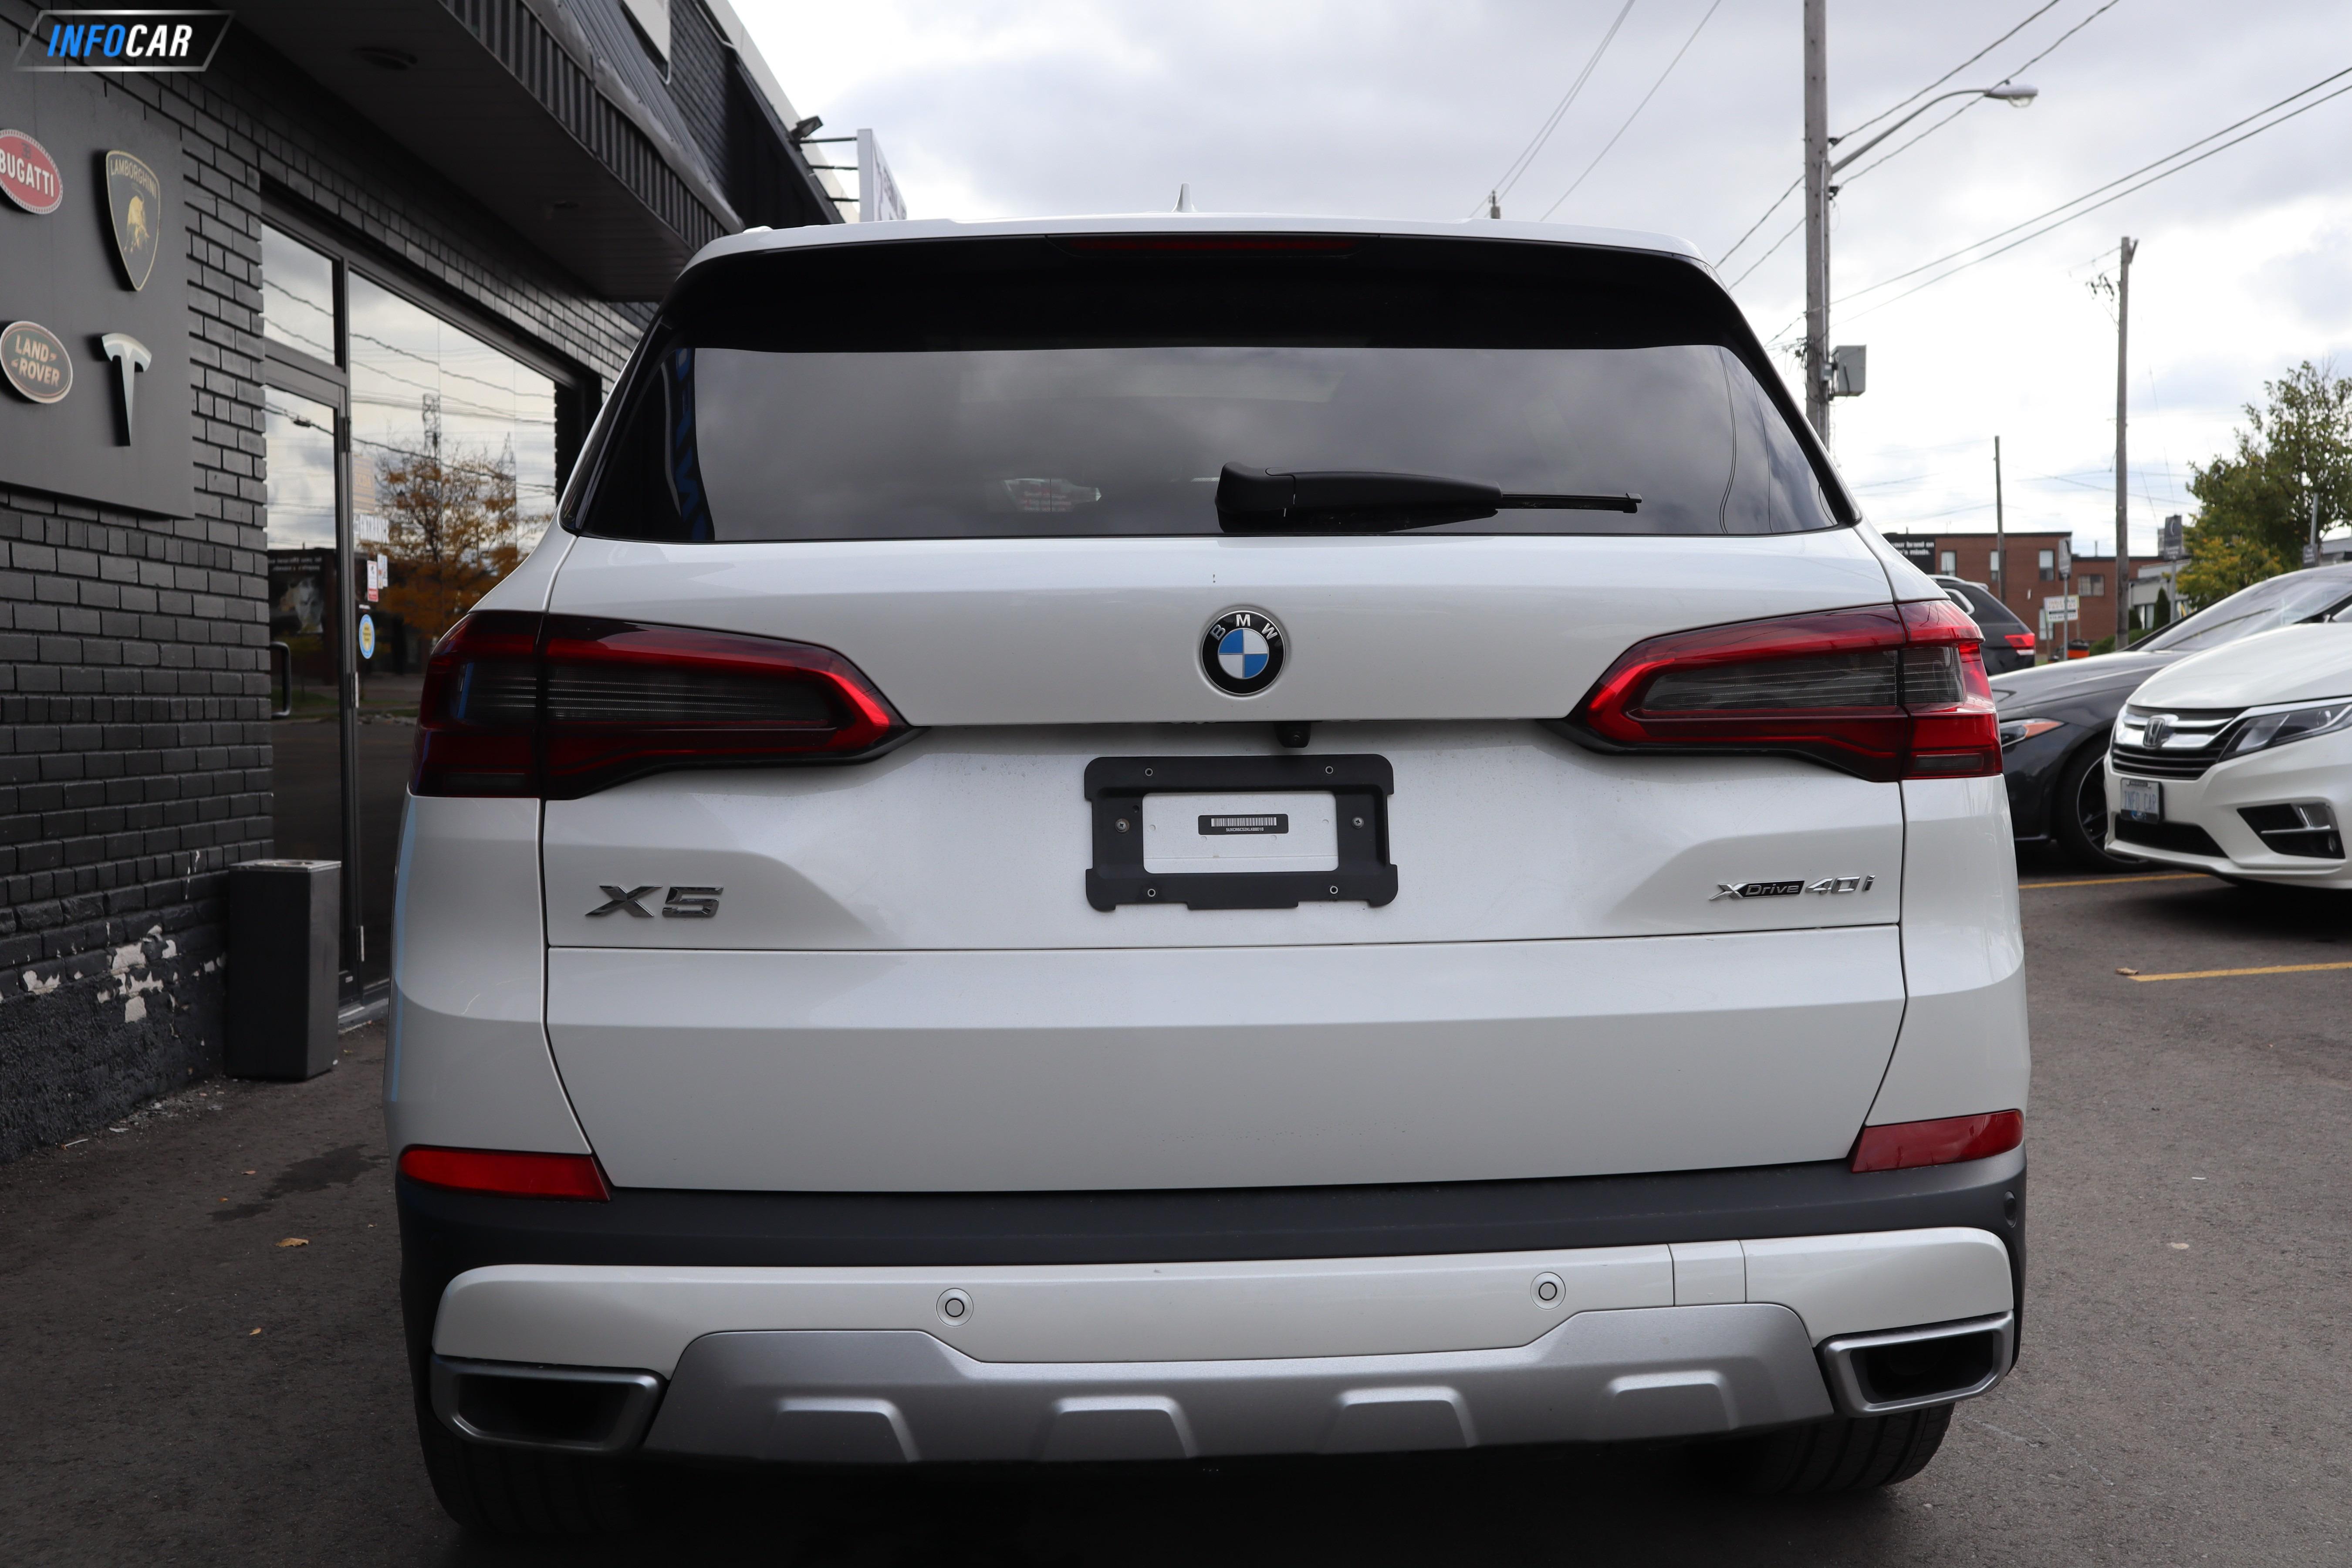 2019 BMW X5 40i - INFOCAR - Toronto's Most Comprehensive New and Used Auto Trading Platform